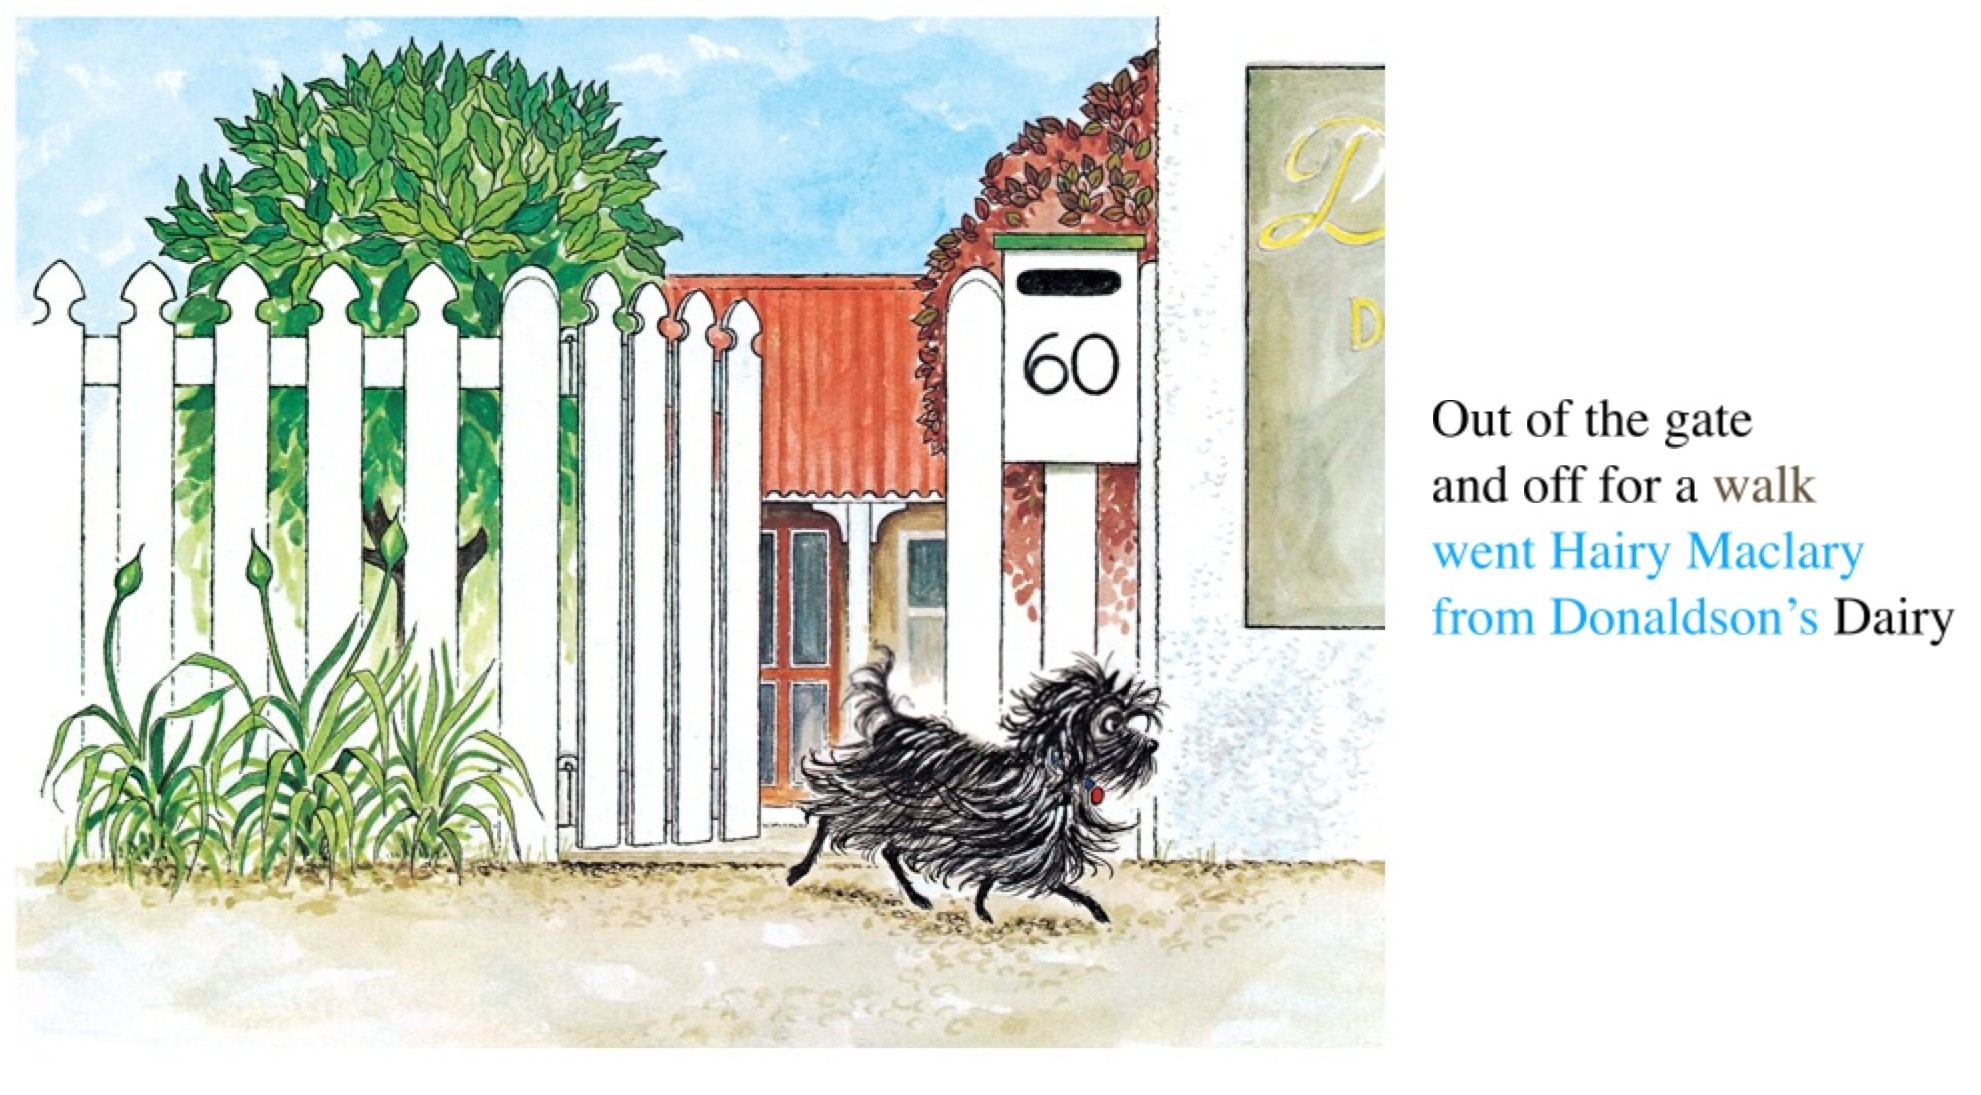 How to produce illustrated, multimedia ebooks